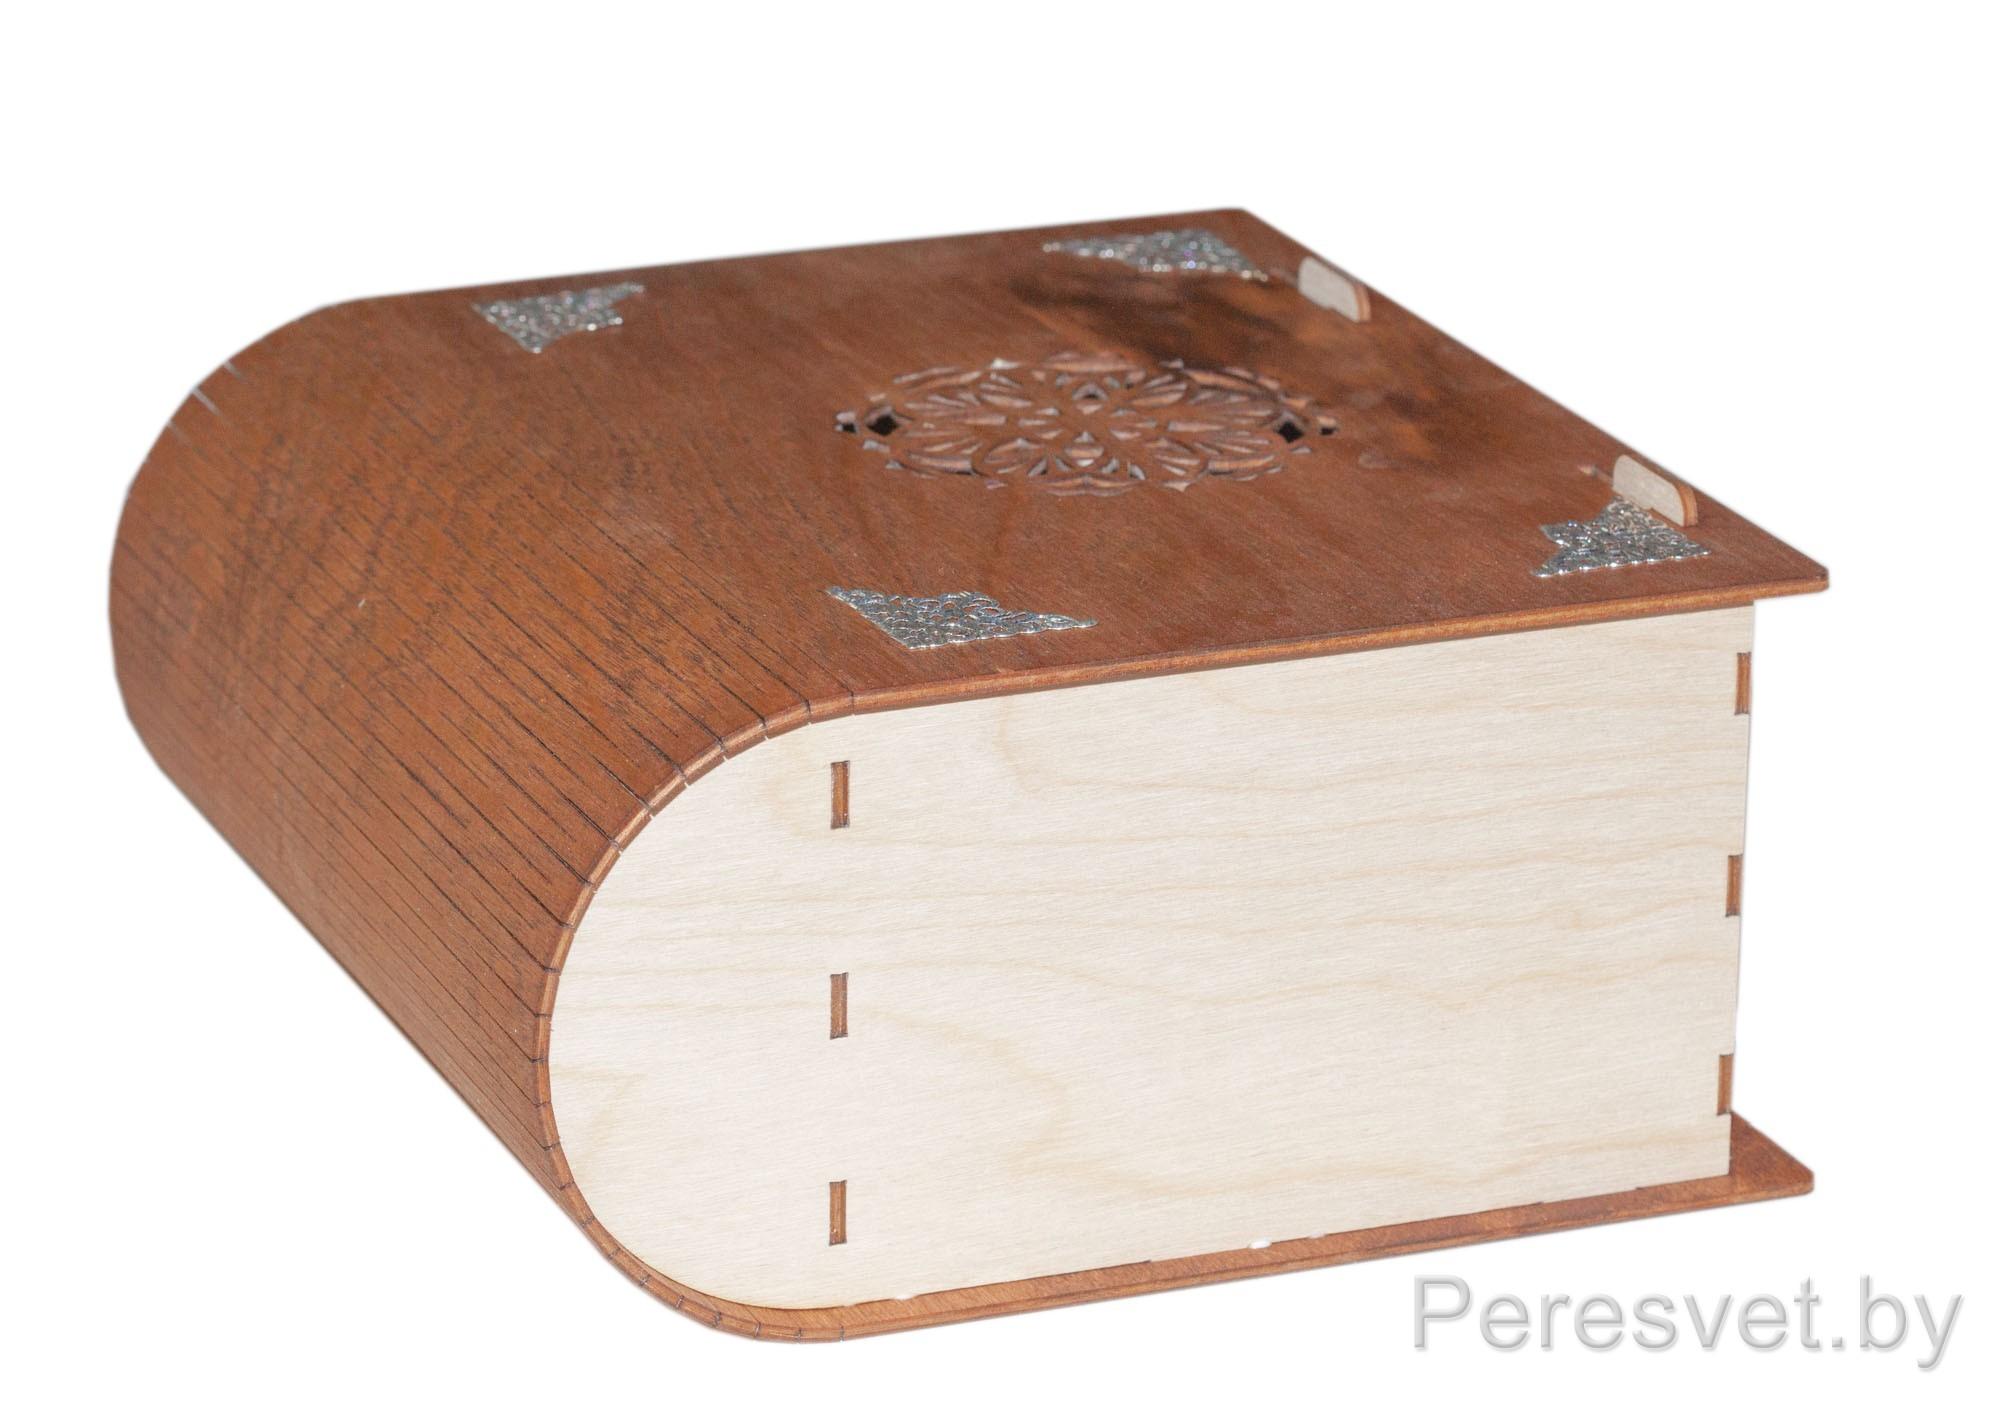 Деревянная упаковка для корпоративных подарков на peresvet.by